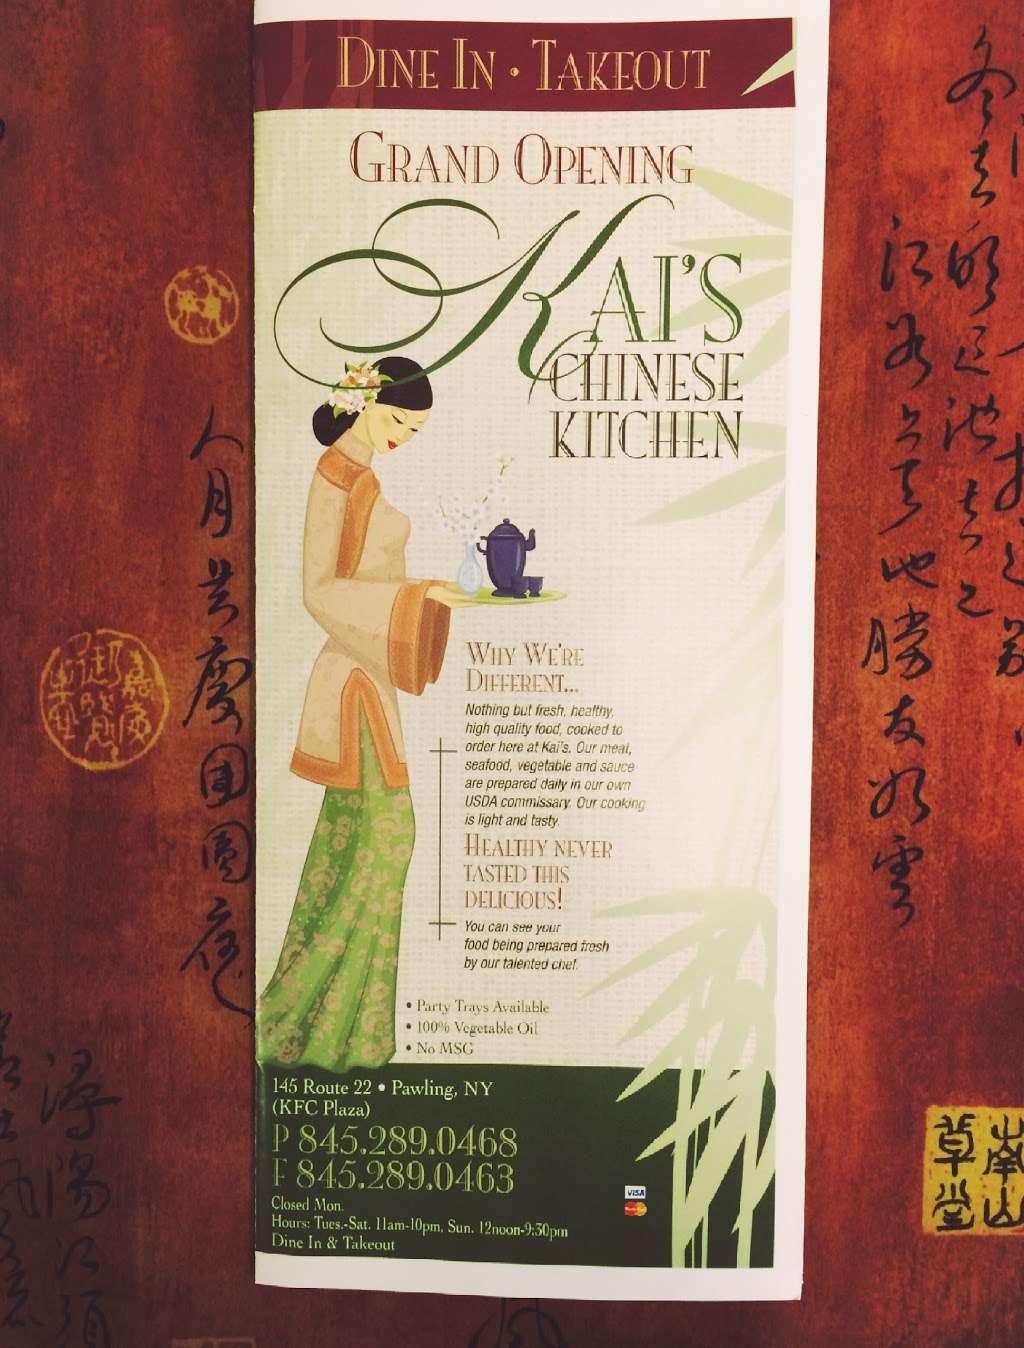 Kais Chinese Kitchen - restaurant    Photo 5 of 10   Address: 145 NY-22, Pawling, NY 12564, USA   Phone: (845) 289-0468